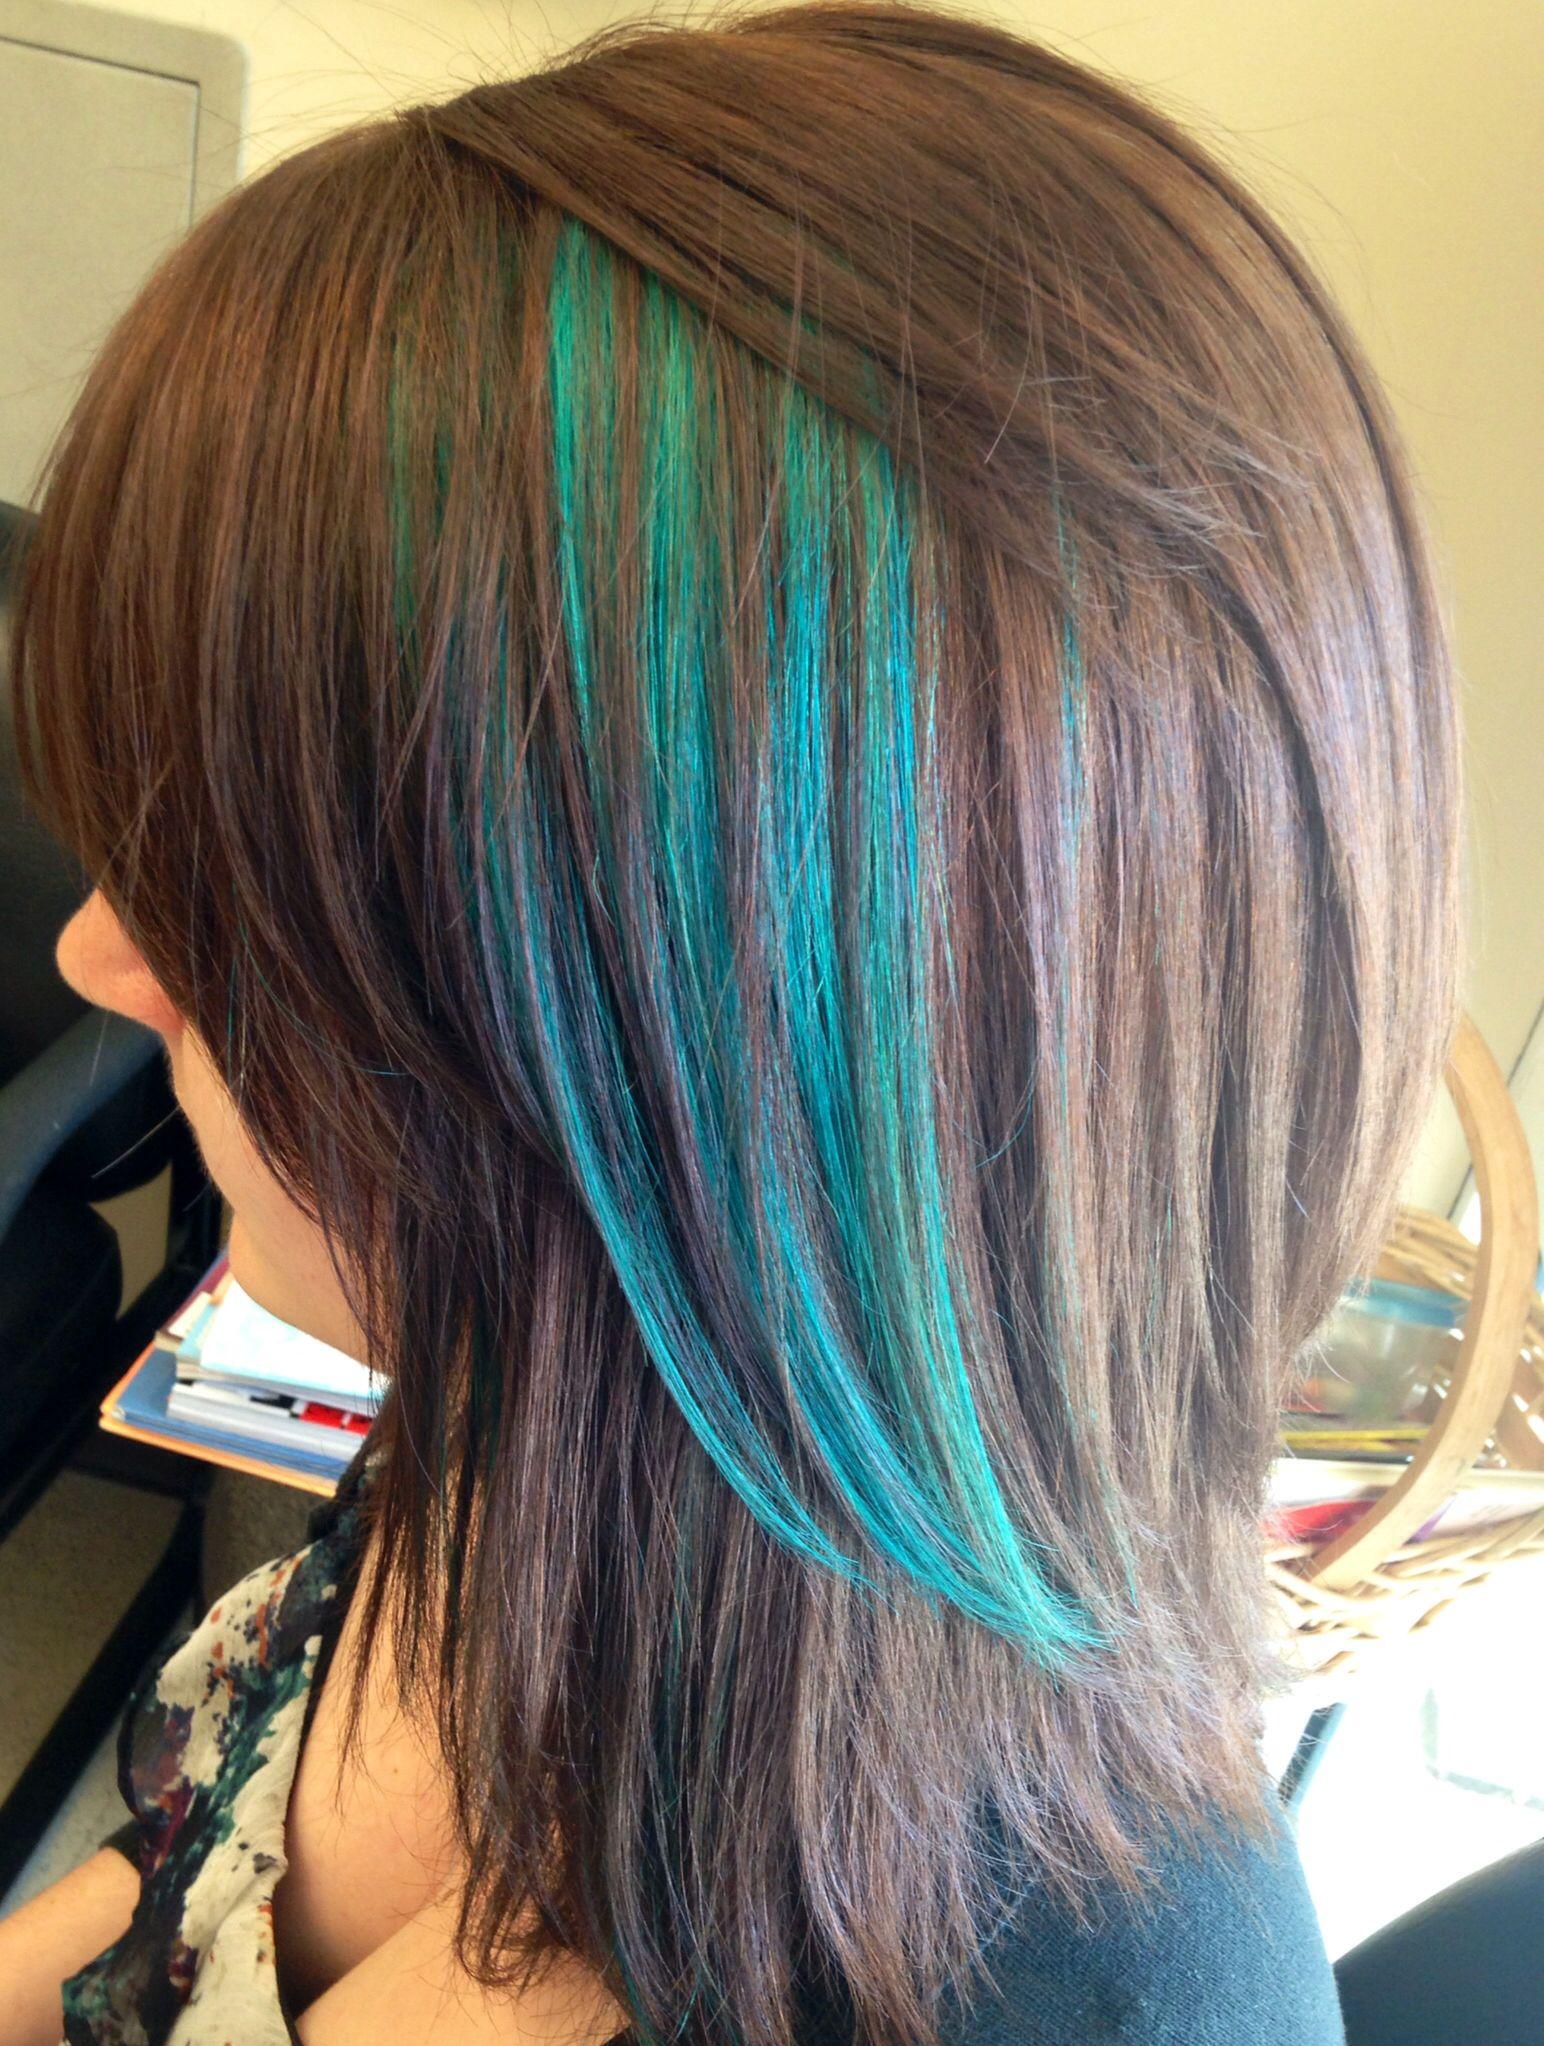 Teal Highlights Hair Pinterest Teal Highlights Teal